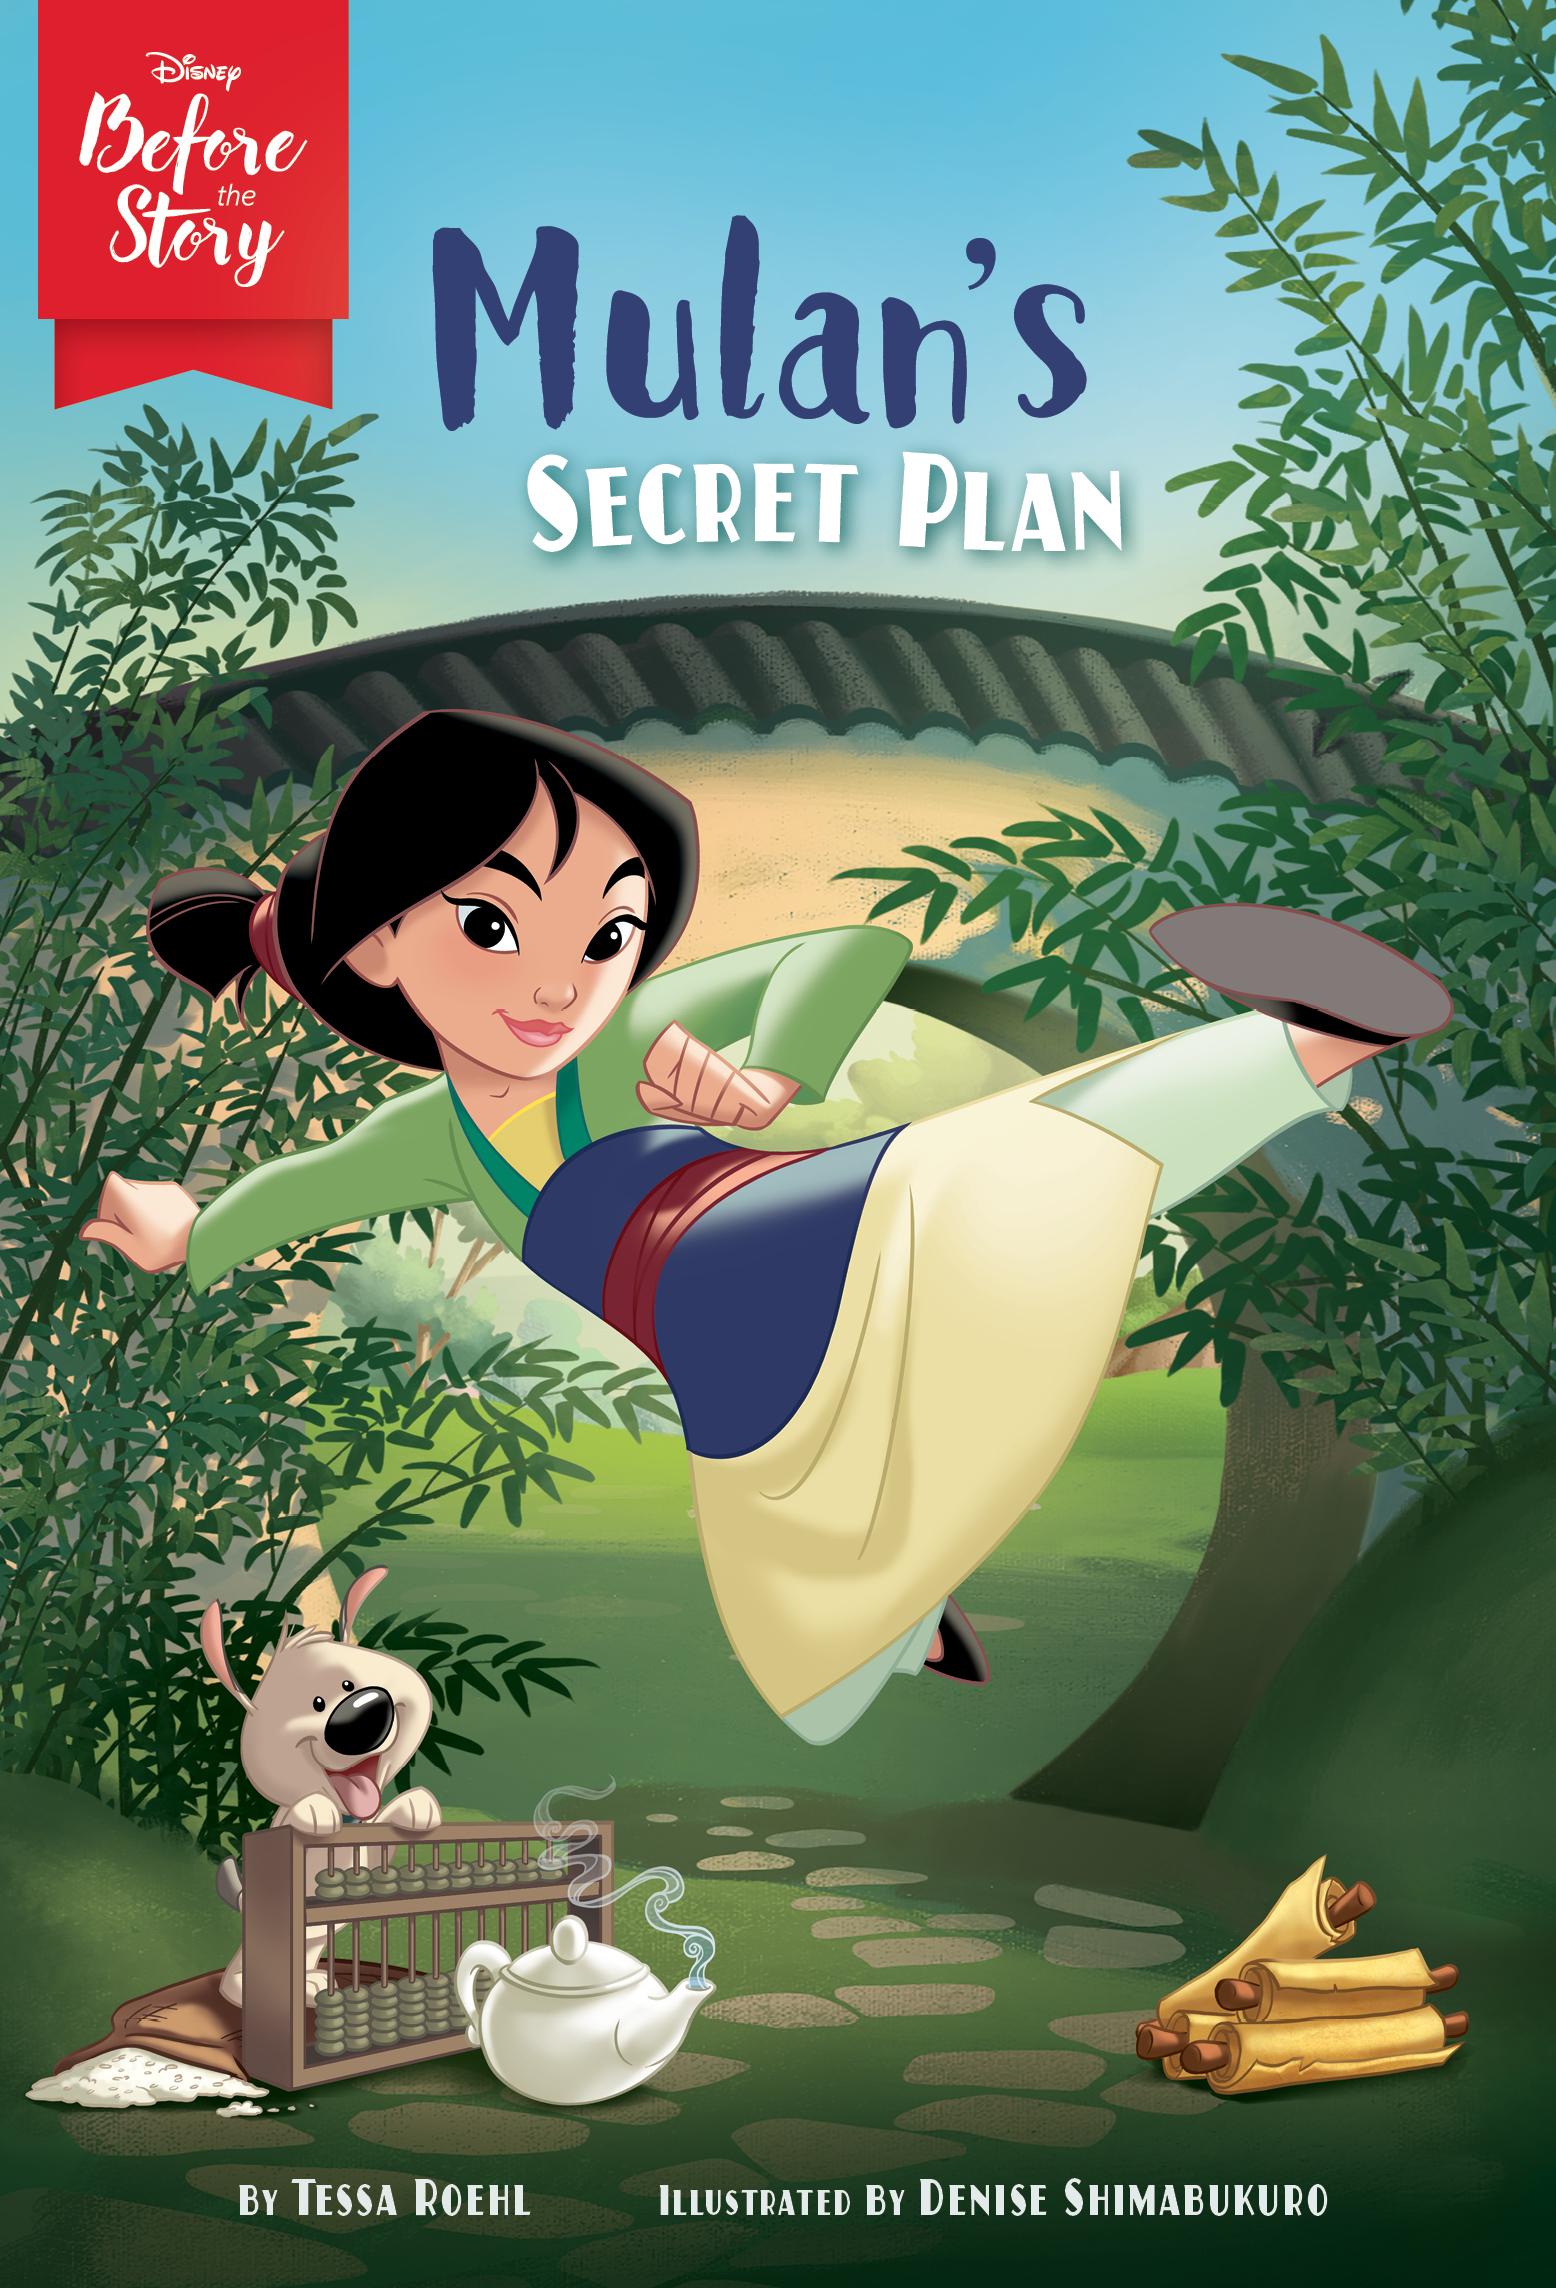 Disney Princess Beginnings: Mulan's Beginnings